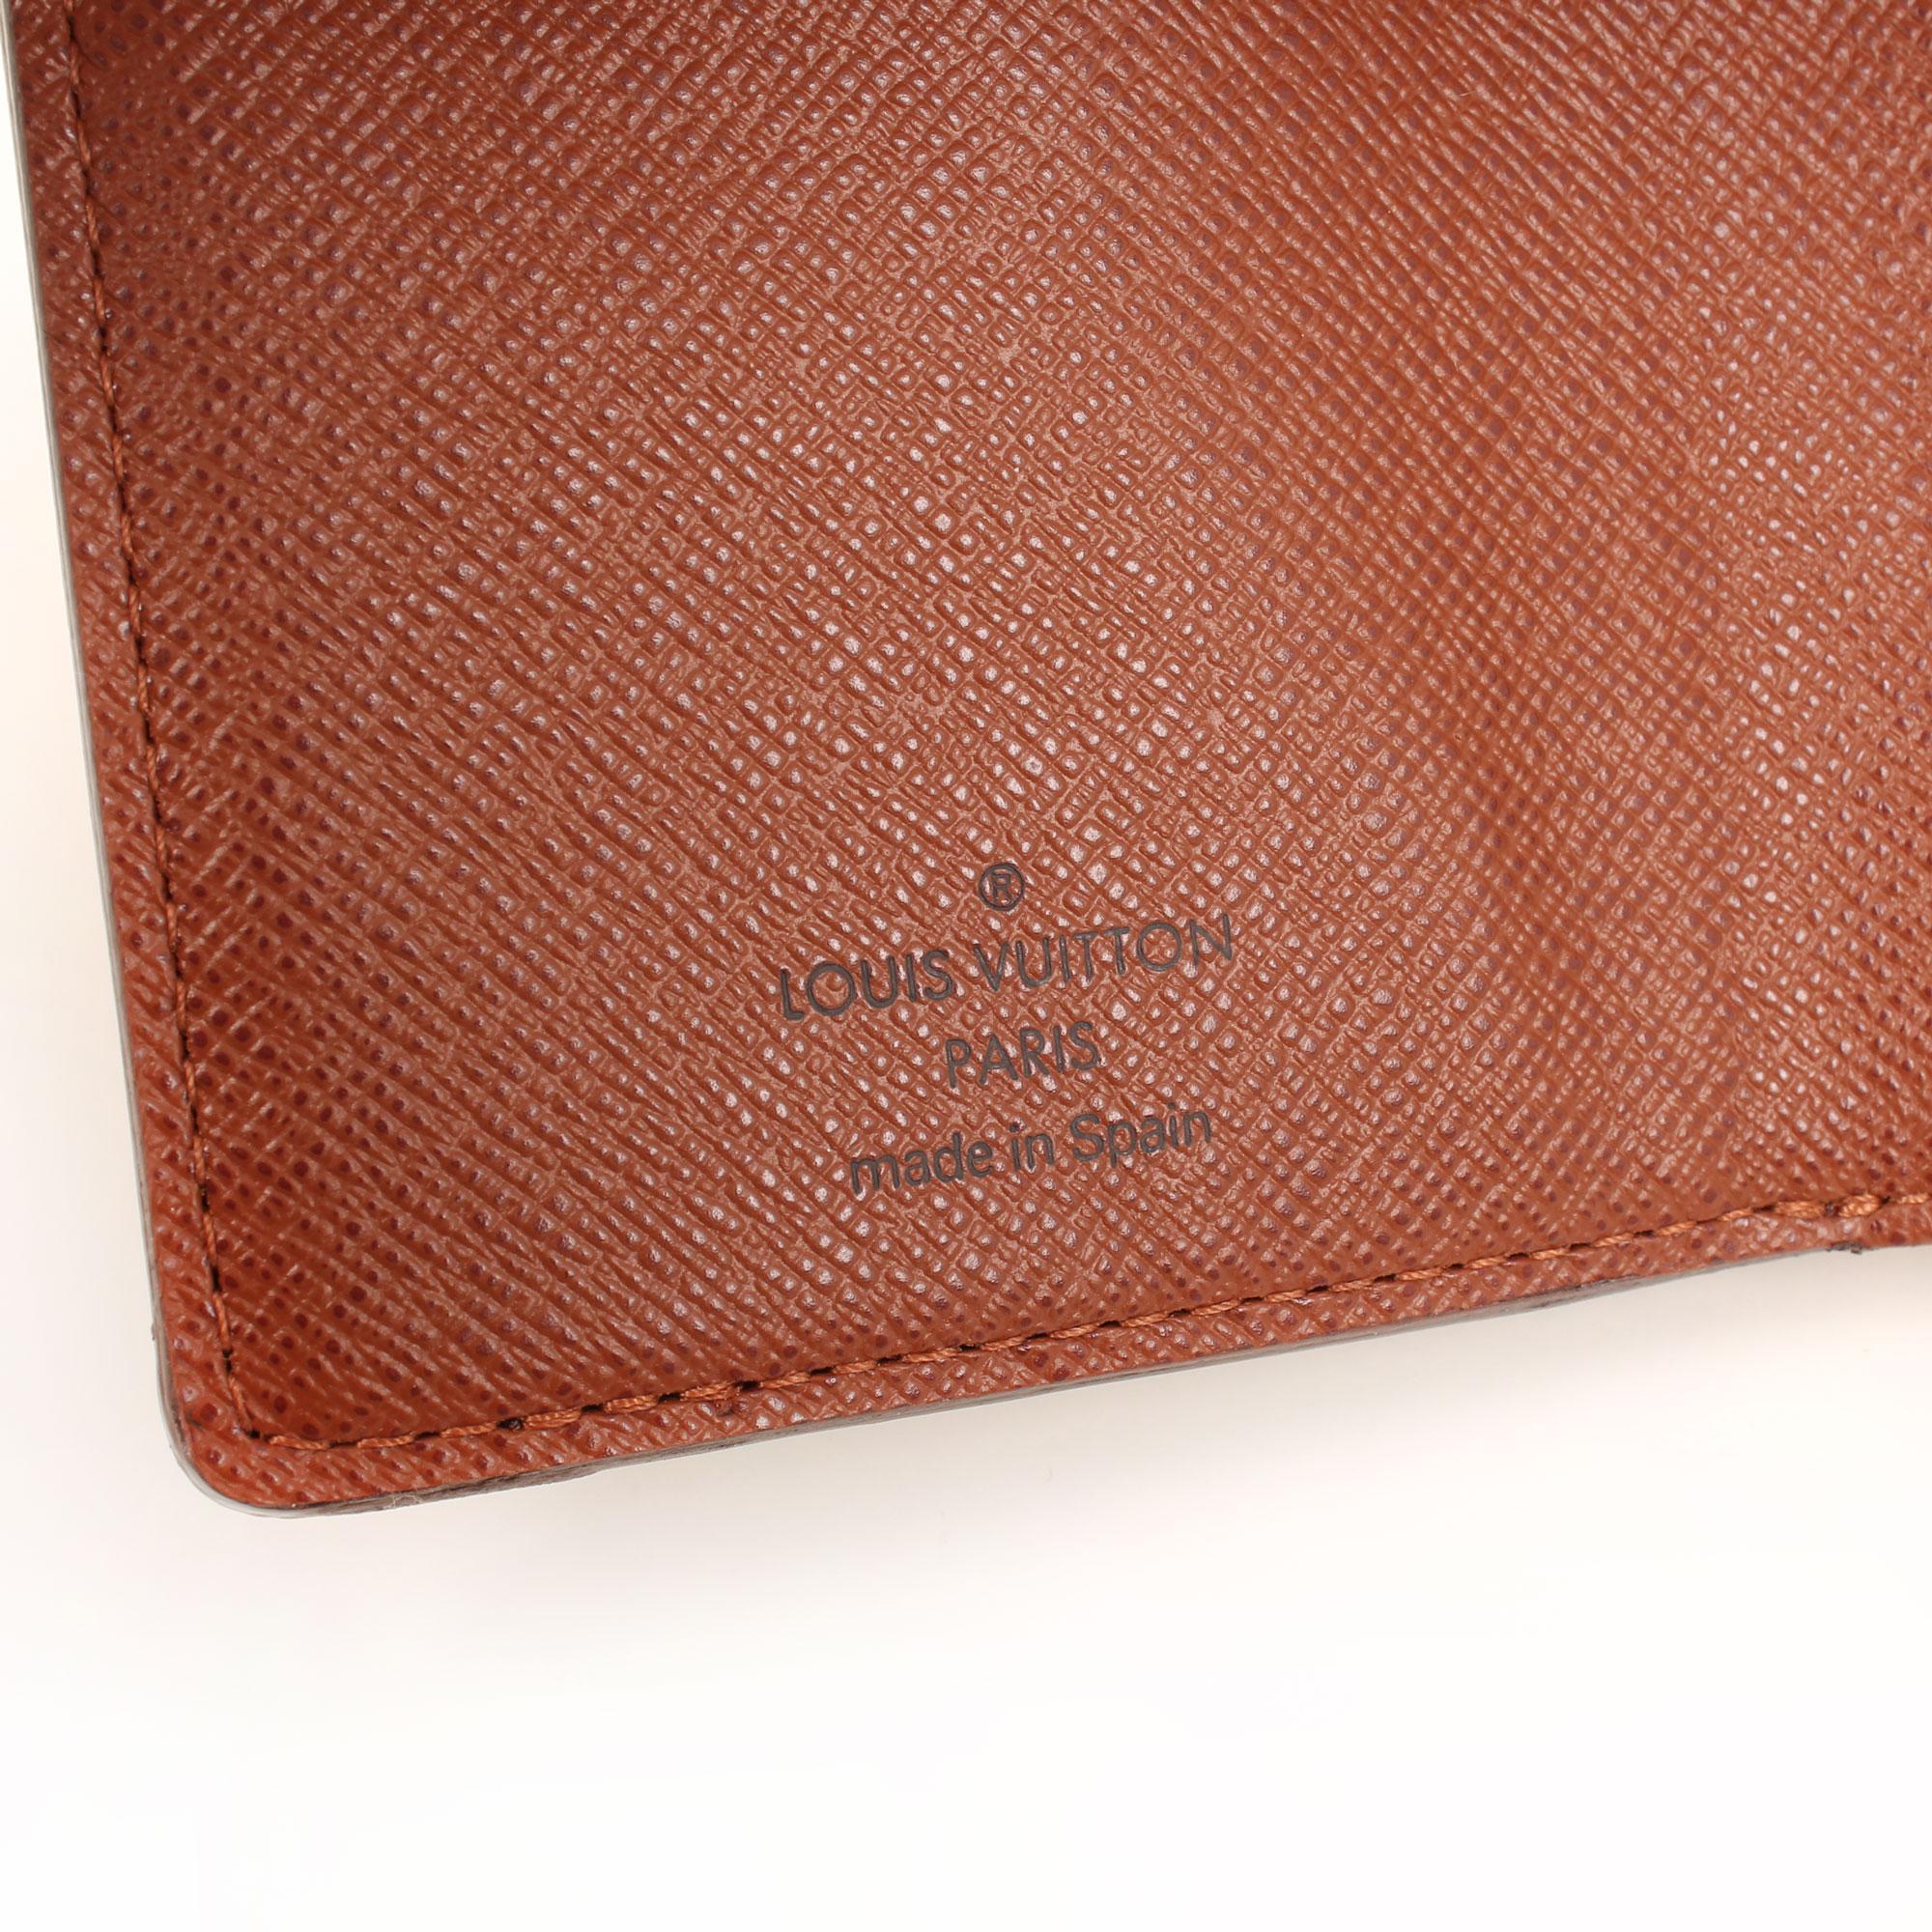 cartera-louis-vuitton-monogram-joey-wallet-marca